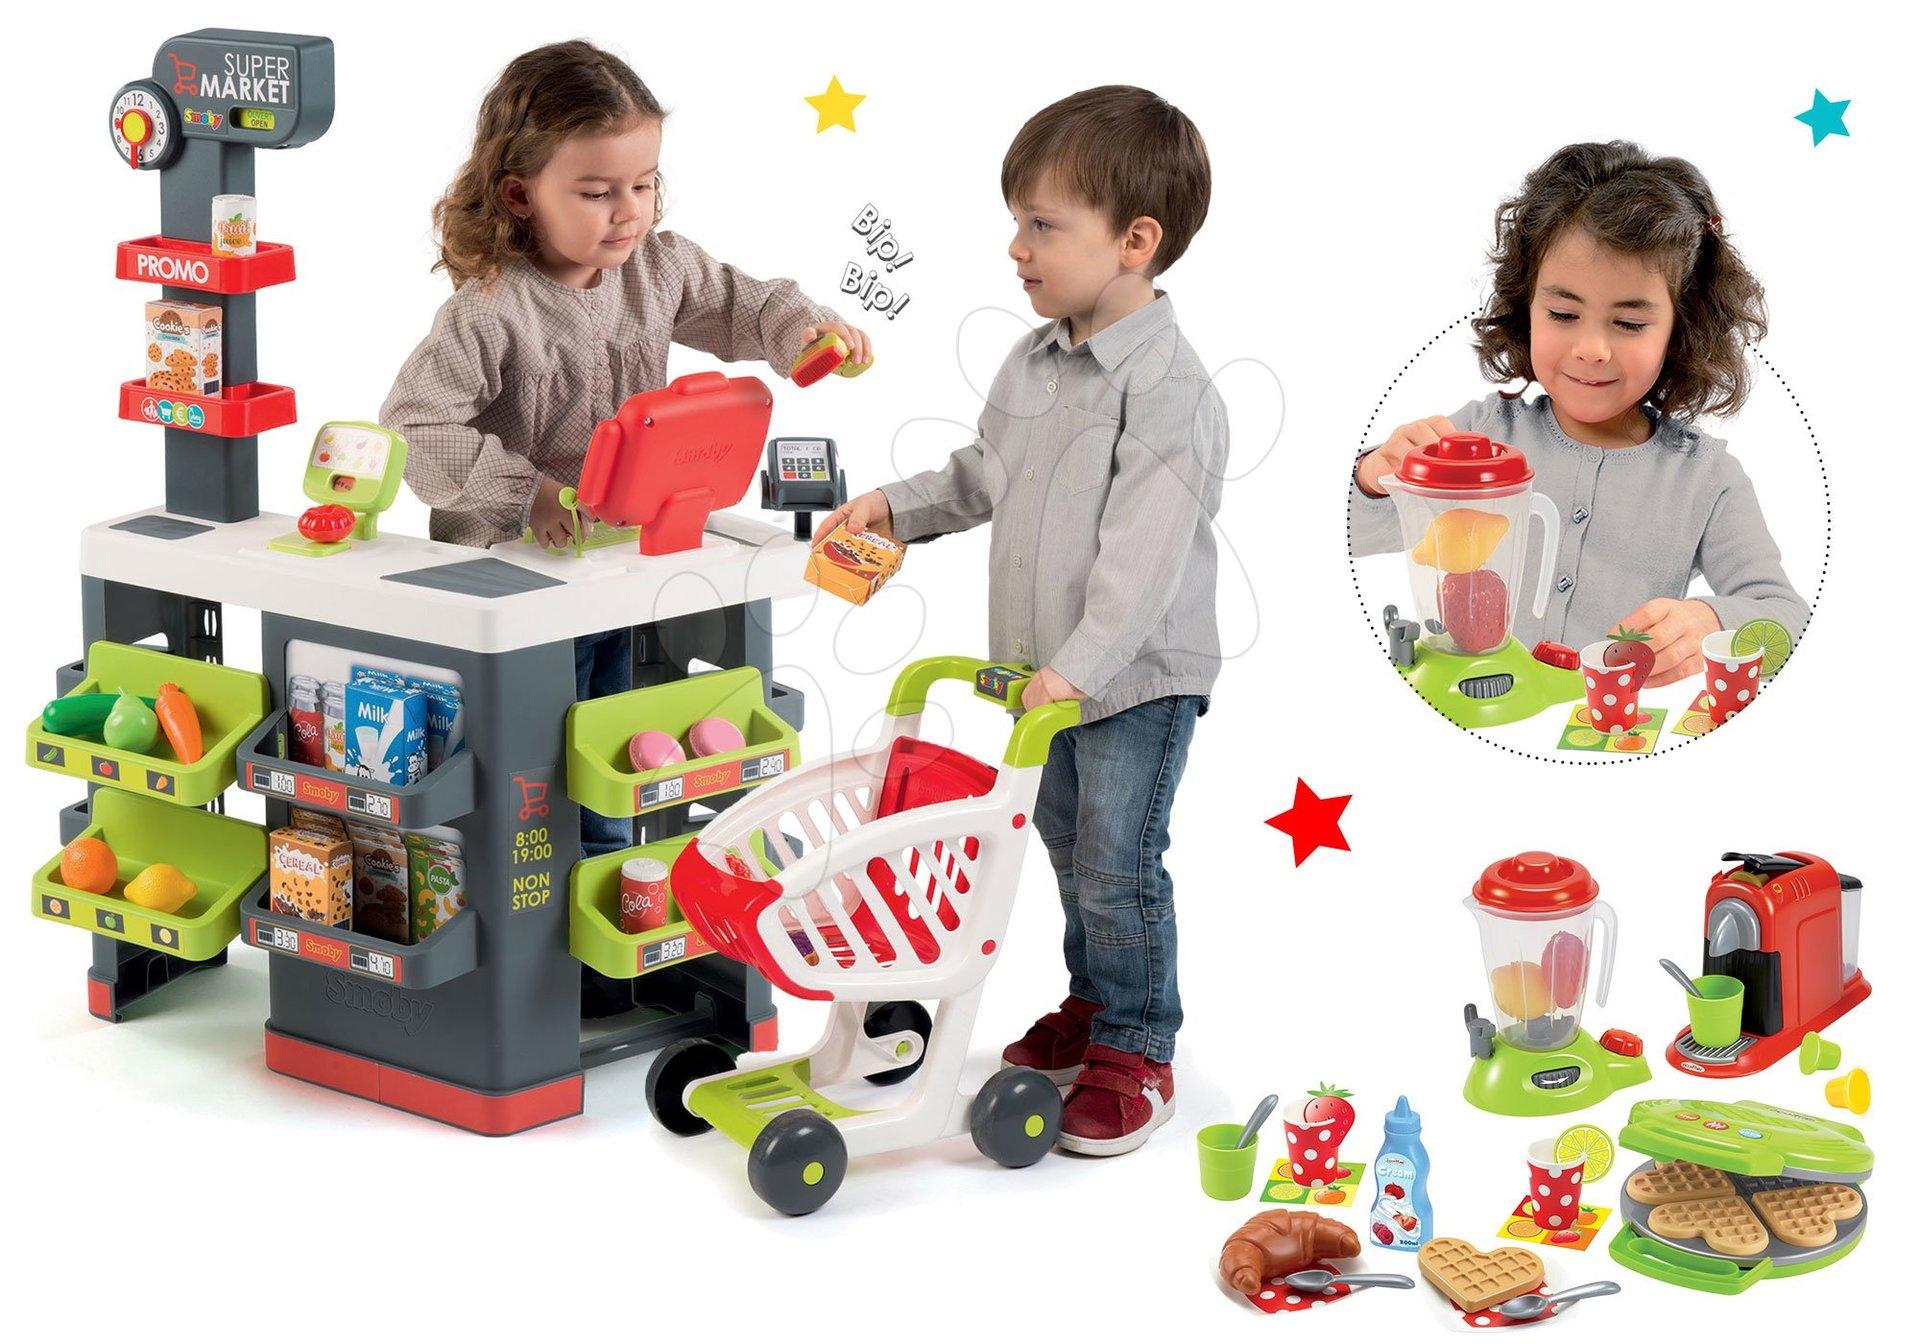 Obchody pre deti sety - Set obchod Supermarket Smoby s elektronickou pokladňou a vaflovač s mixérom a kávovarom